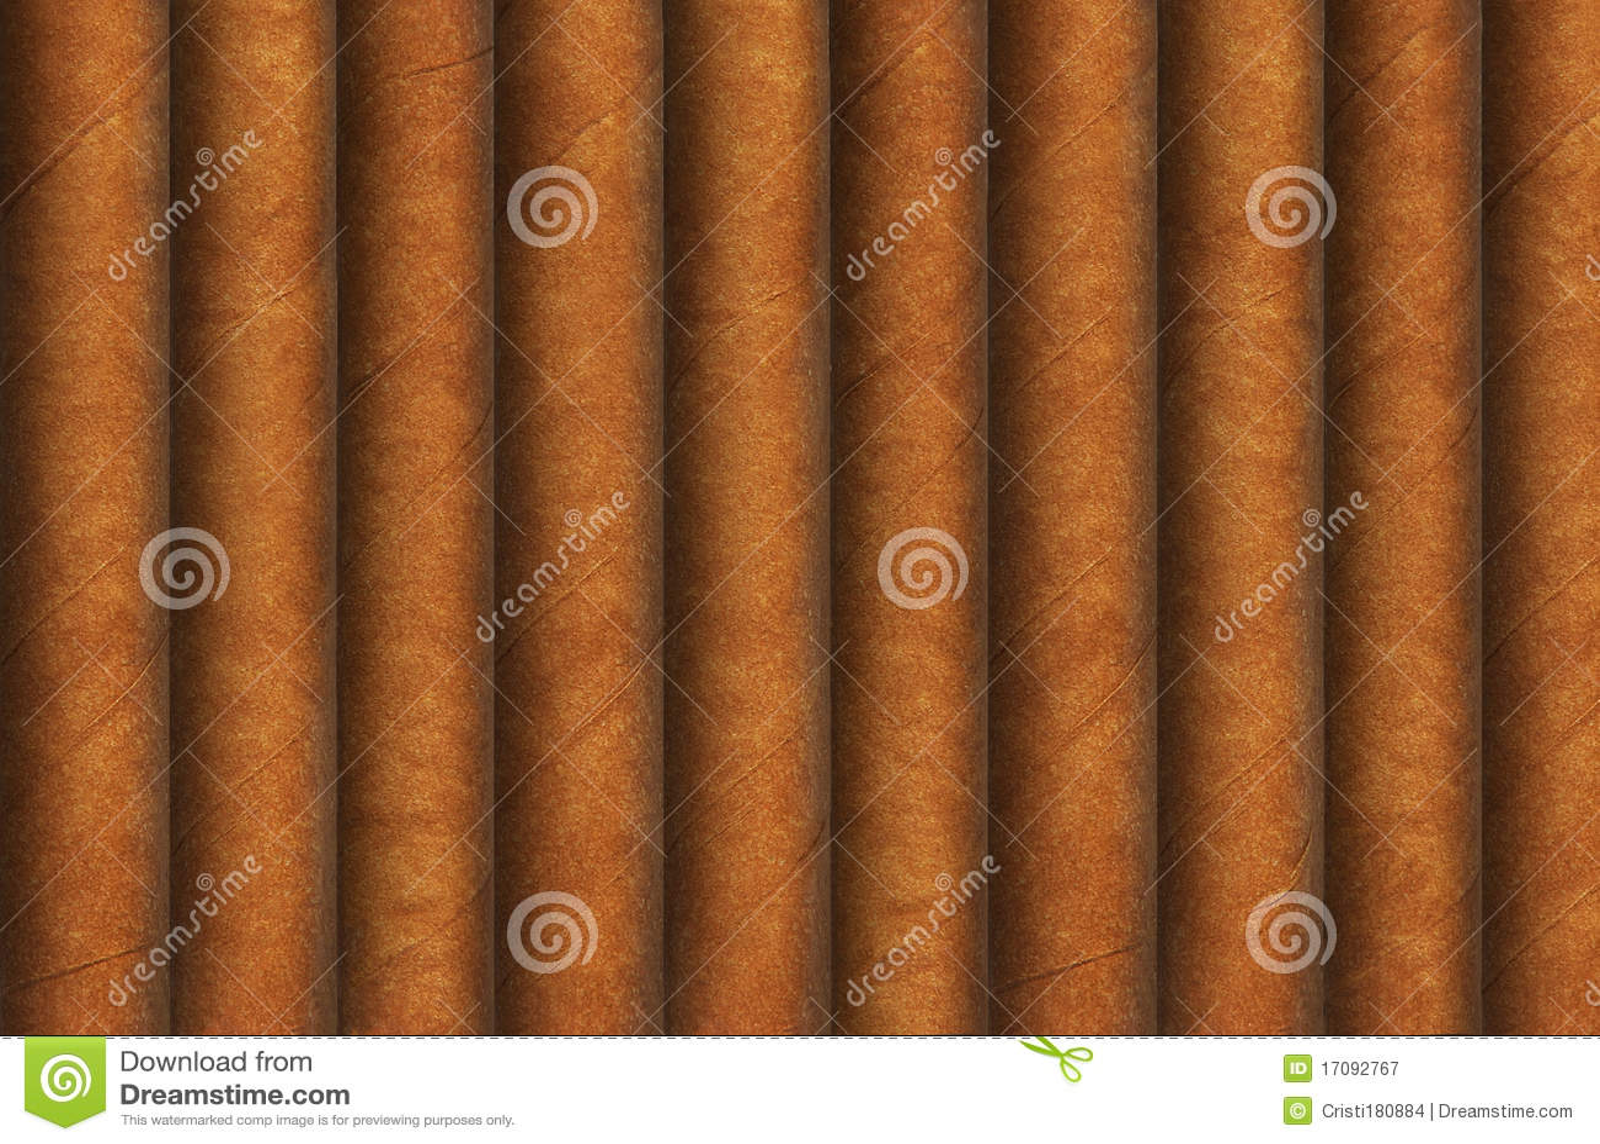 Kubanische Zigarrebeschaffenheit